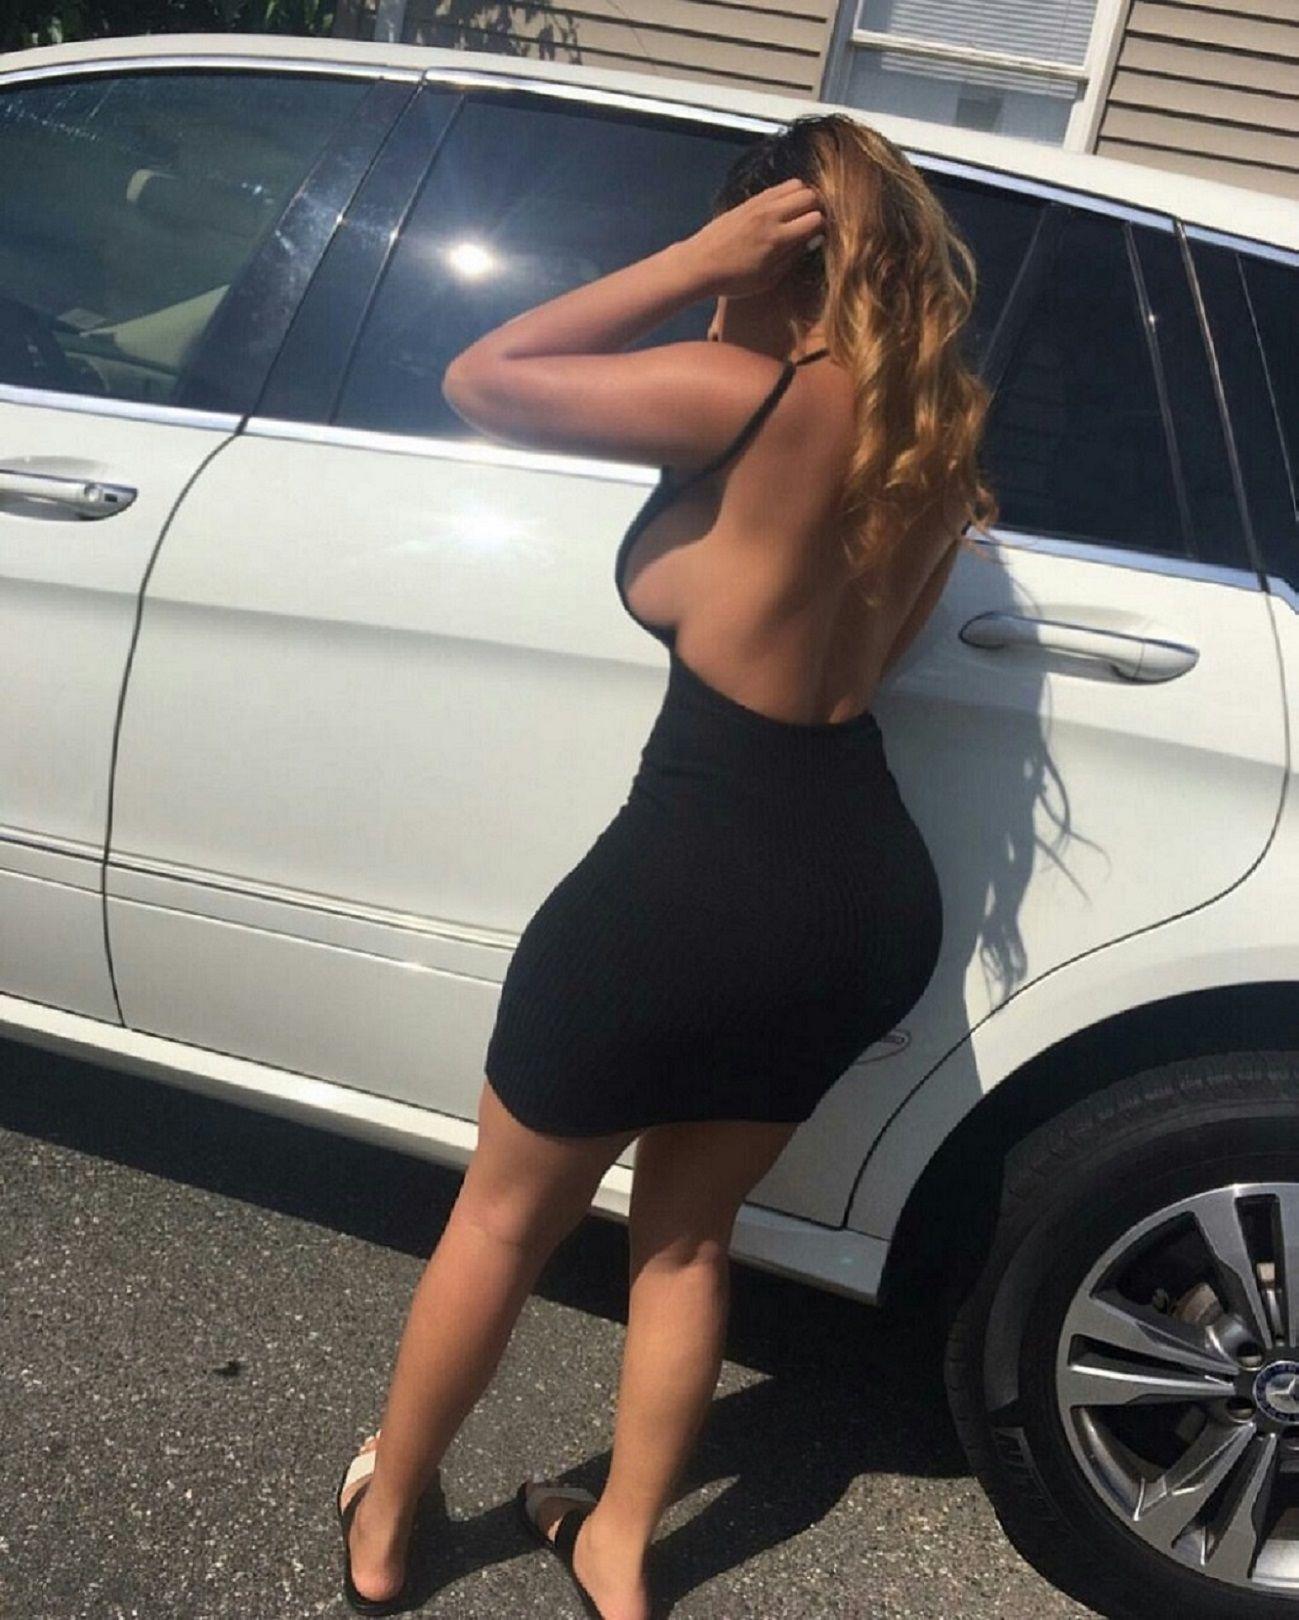 giselle lynette big booty & big boobs | model - giselle lynette